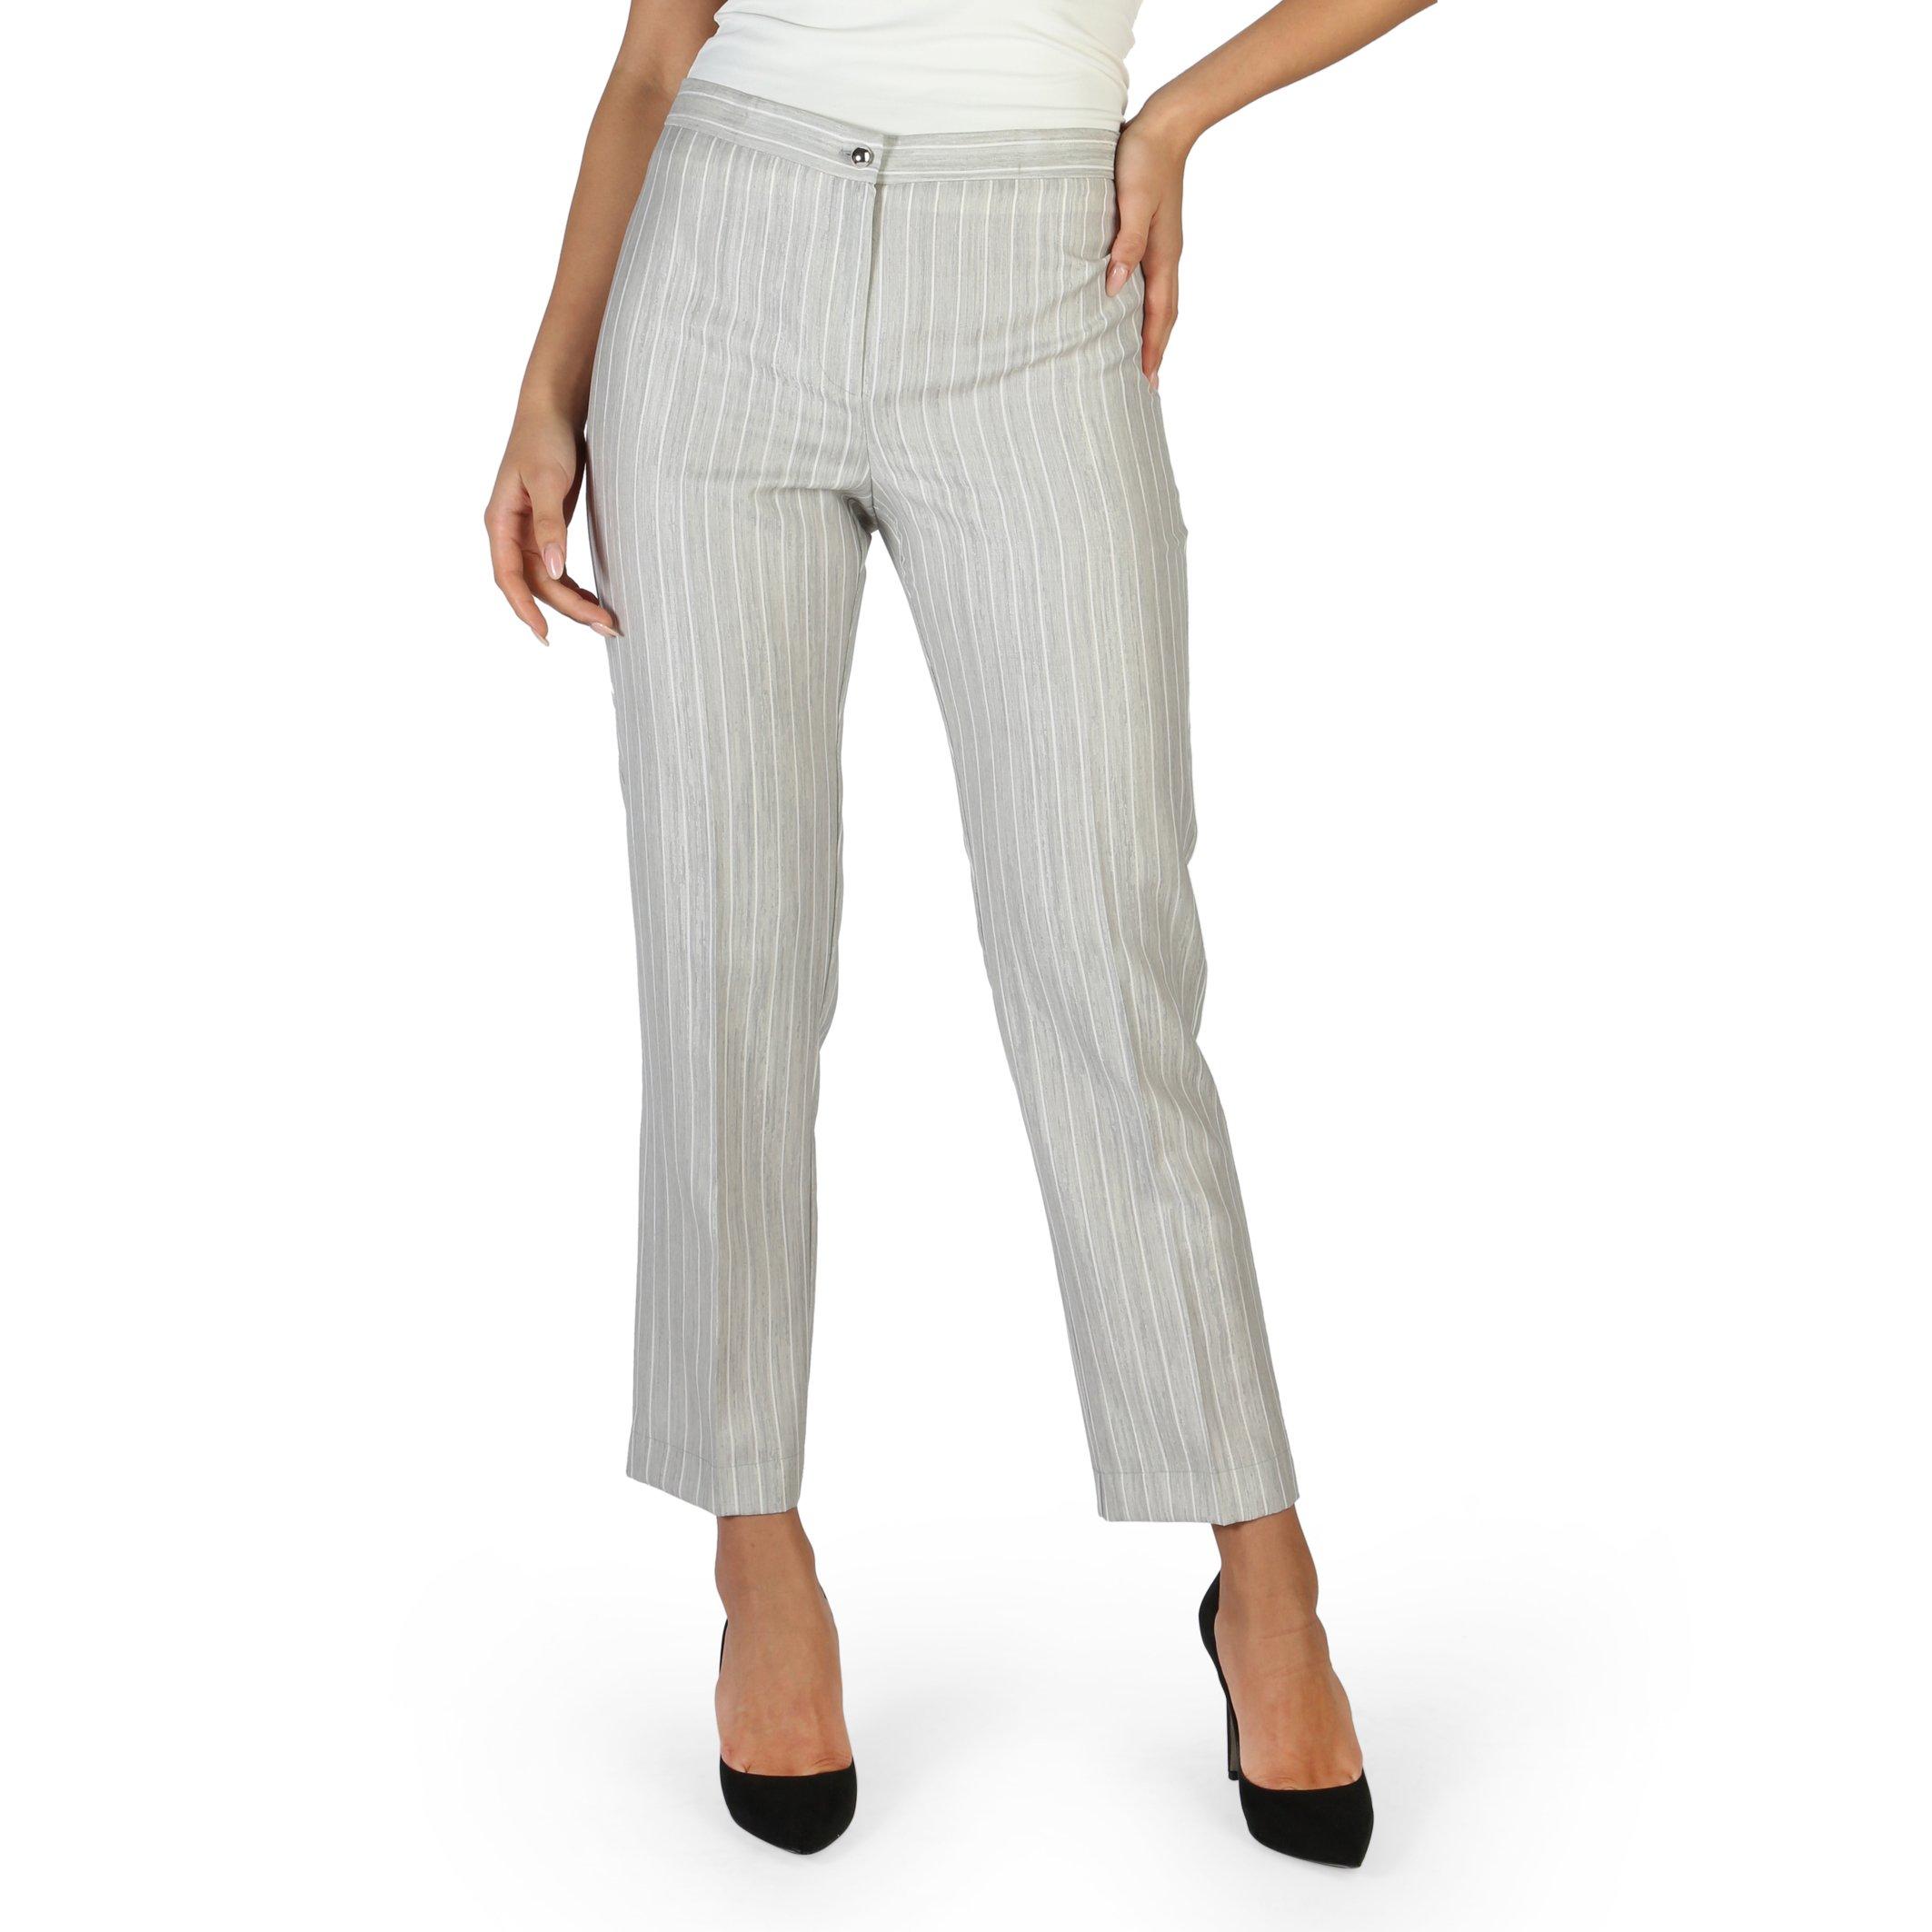 Fontana 2.0 Women's RENATE Trouser Various Colours 325721 - grey 40